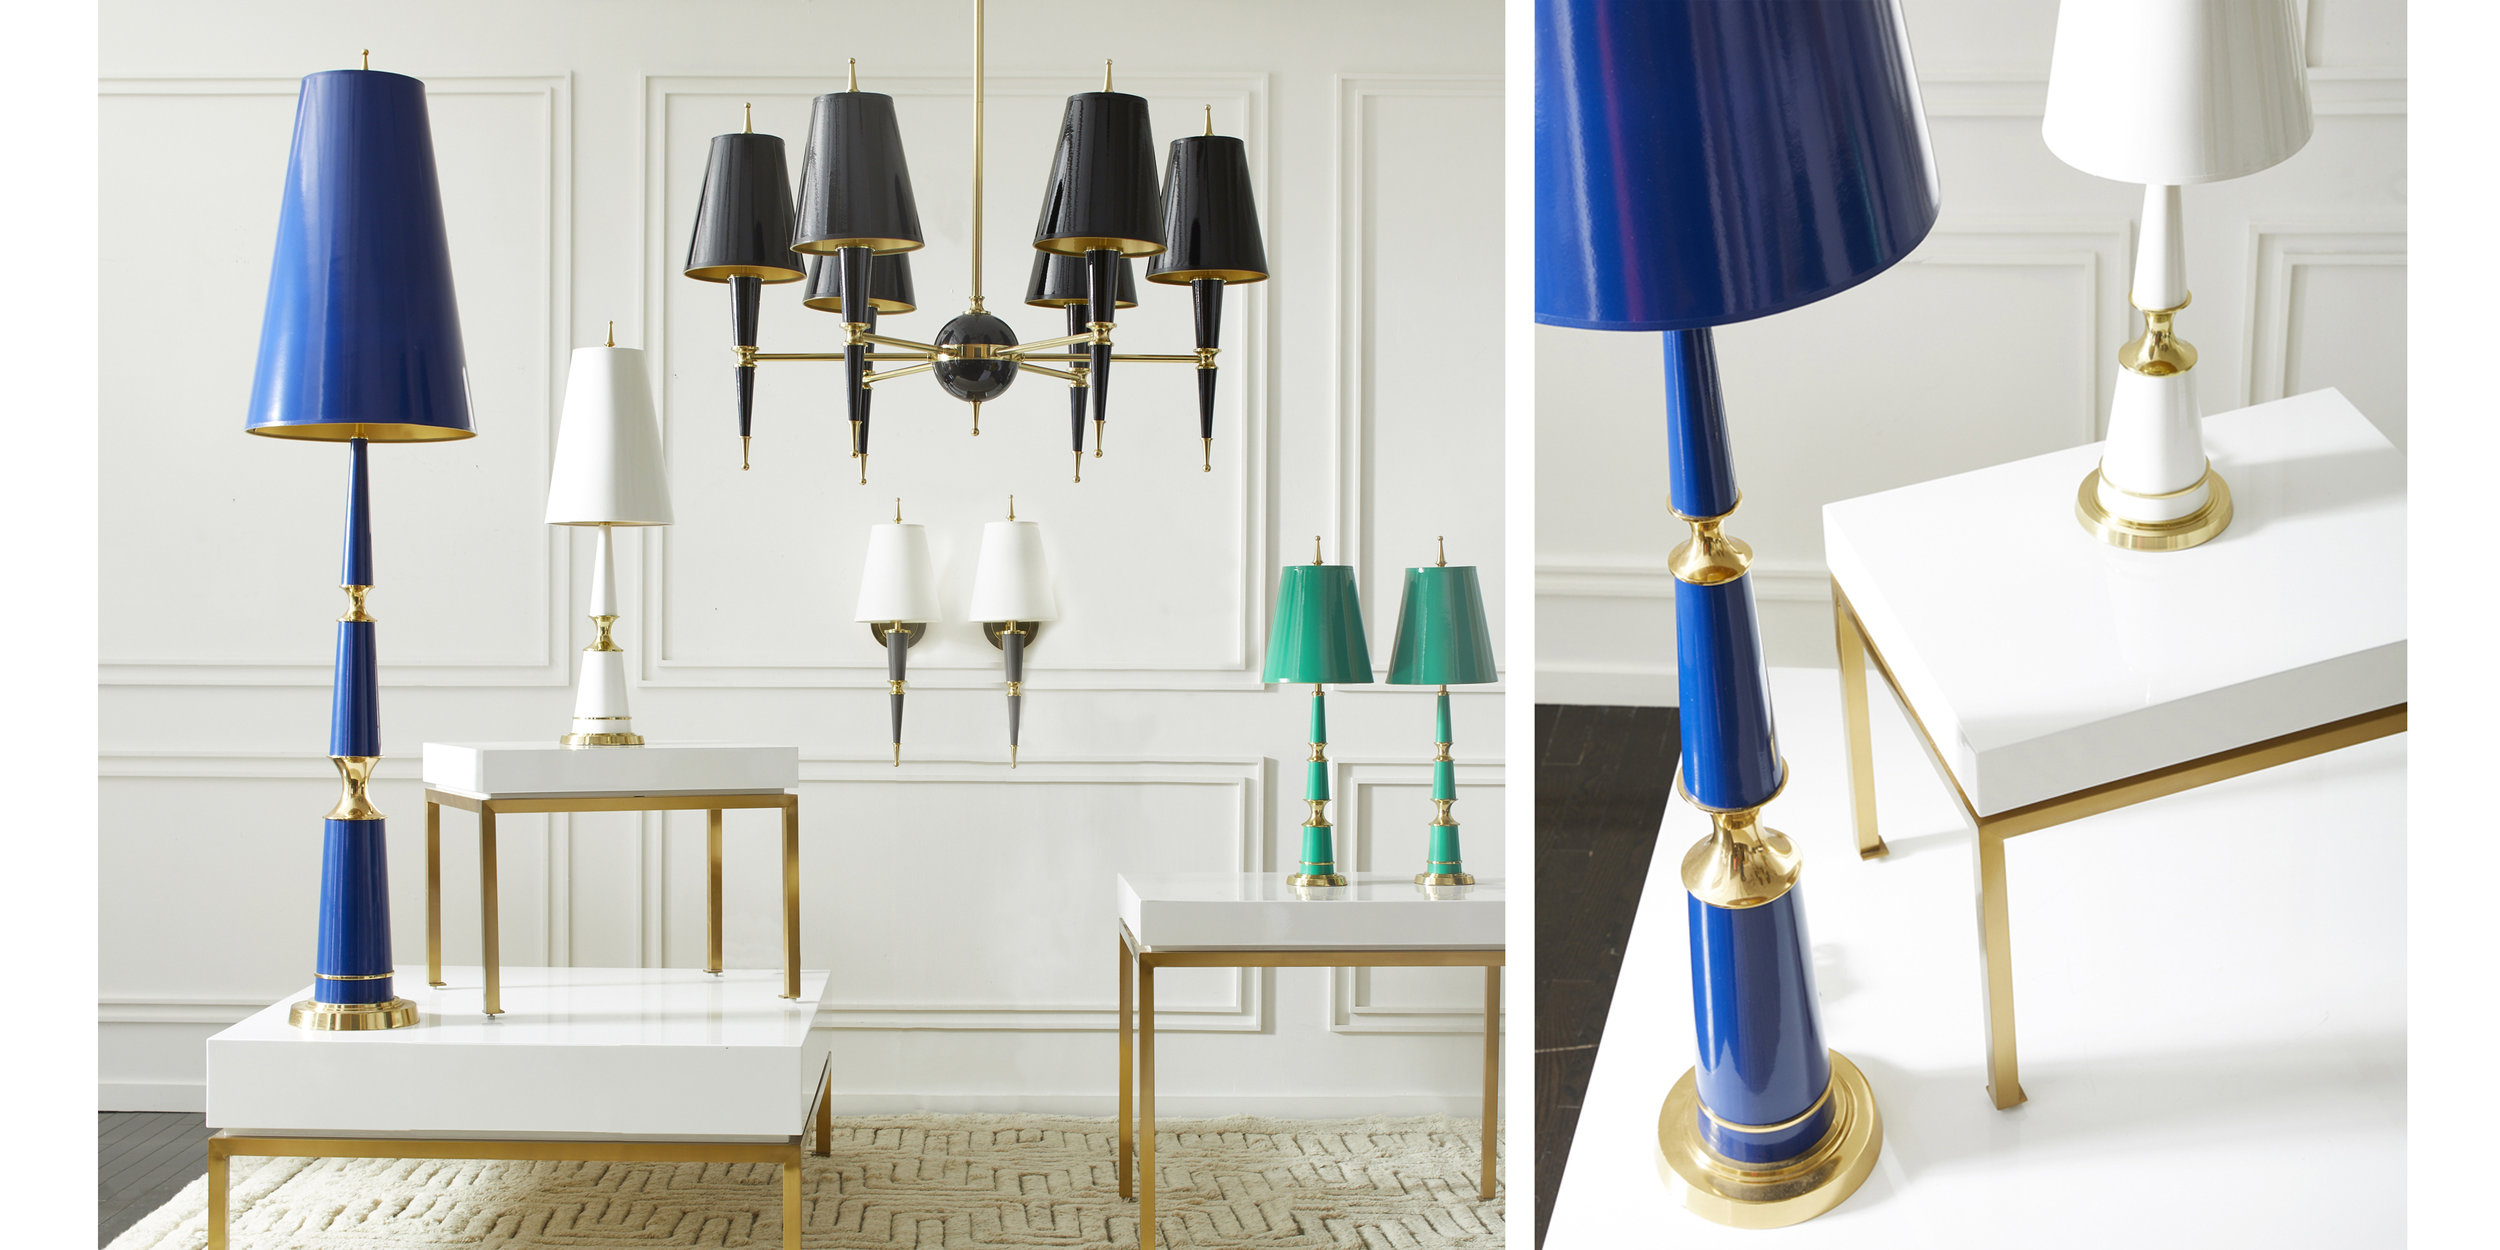 Jonathan_Adler_Versailles_Neoclassical_Lighting_Lamp_Chandelier.jpg